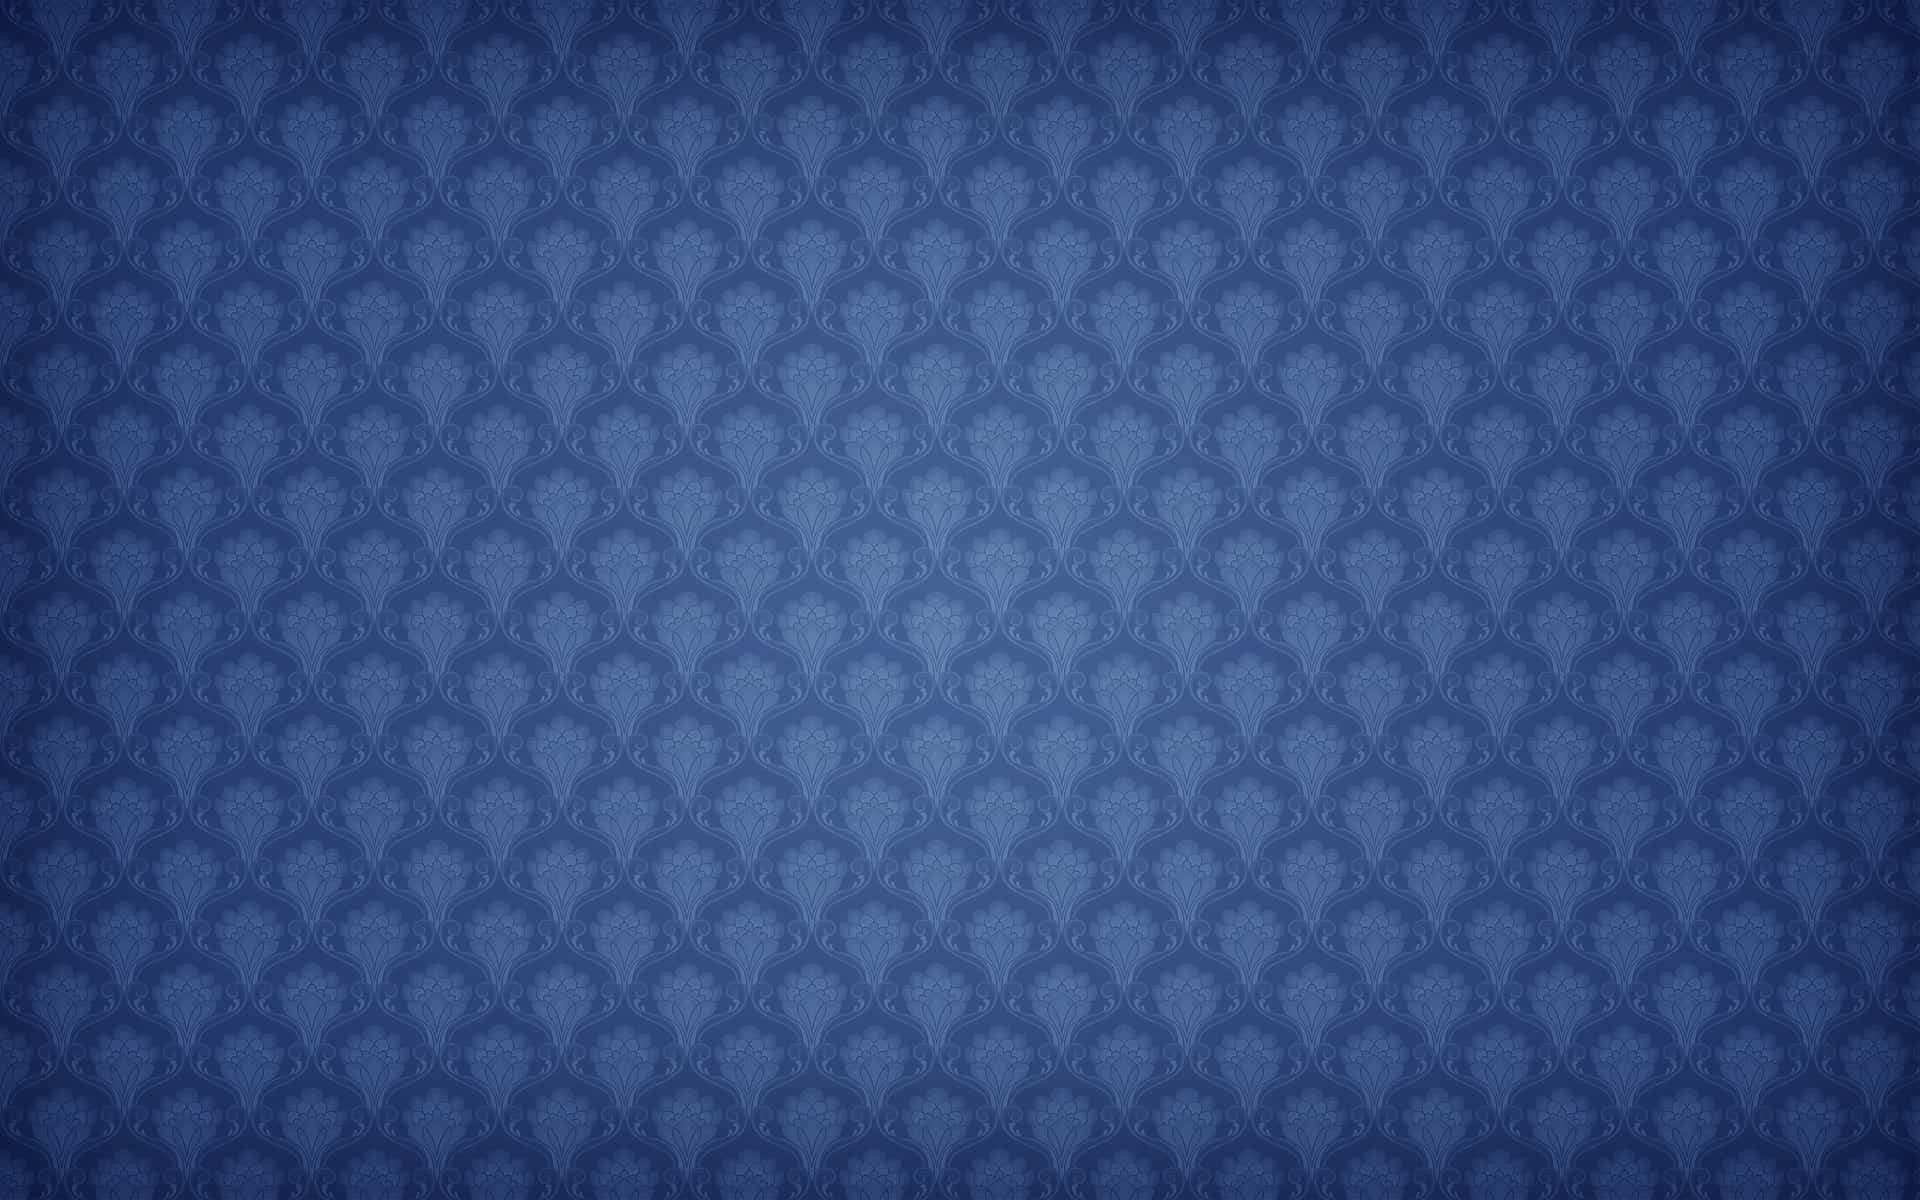 Floral Wallpaper 024